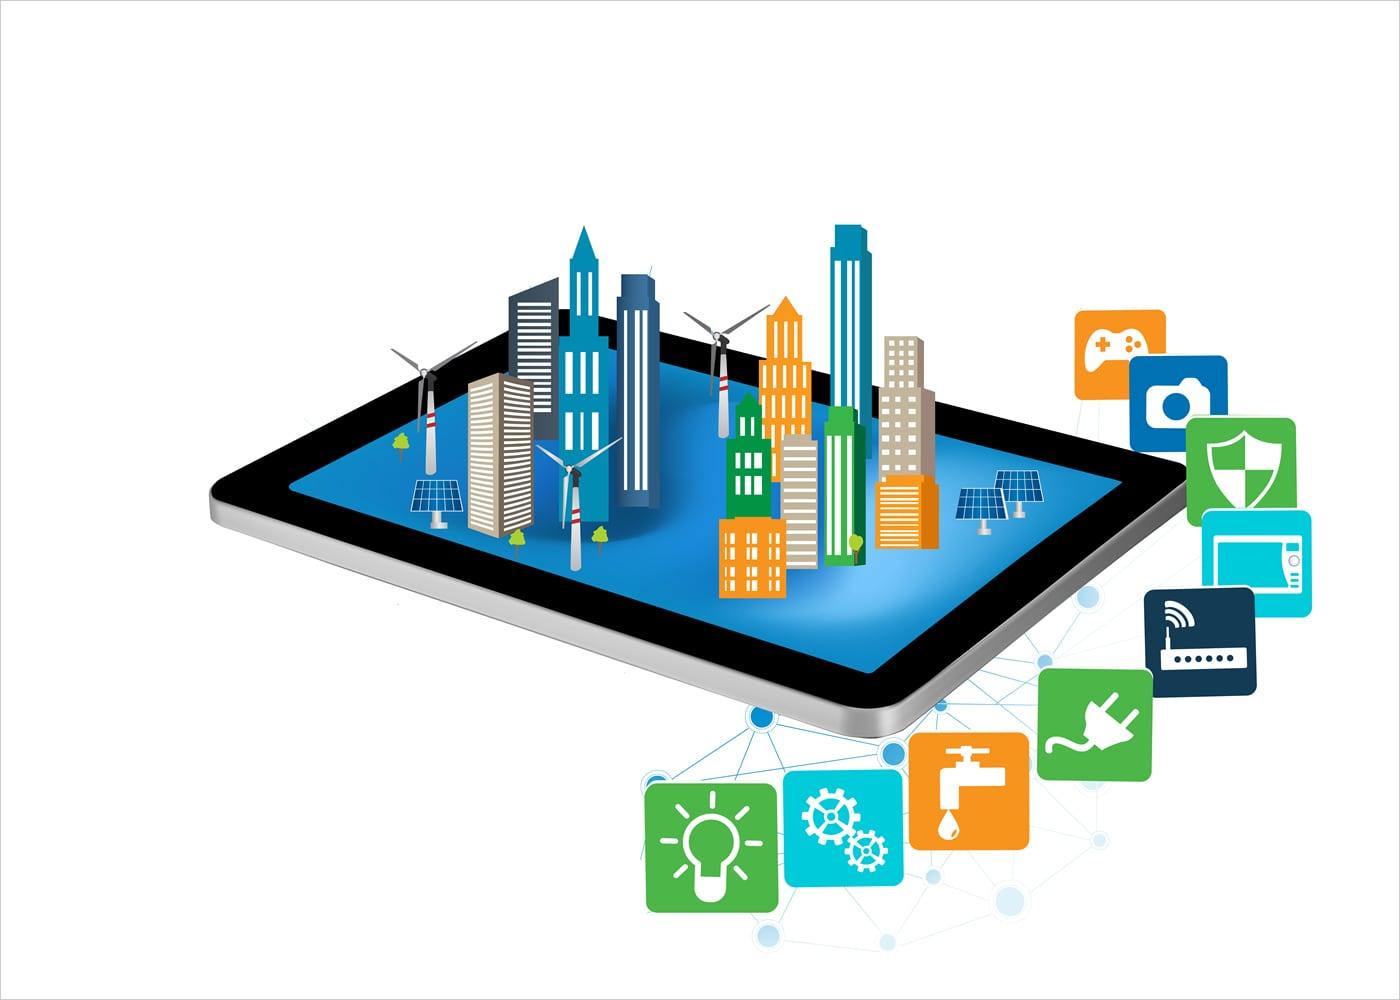 naem-webinar-2018-iot-technology-for-enhanced-environmental-compliance-700x500